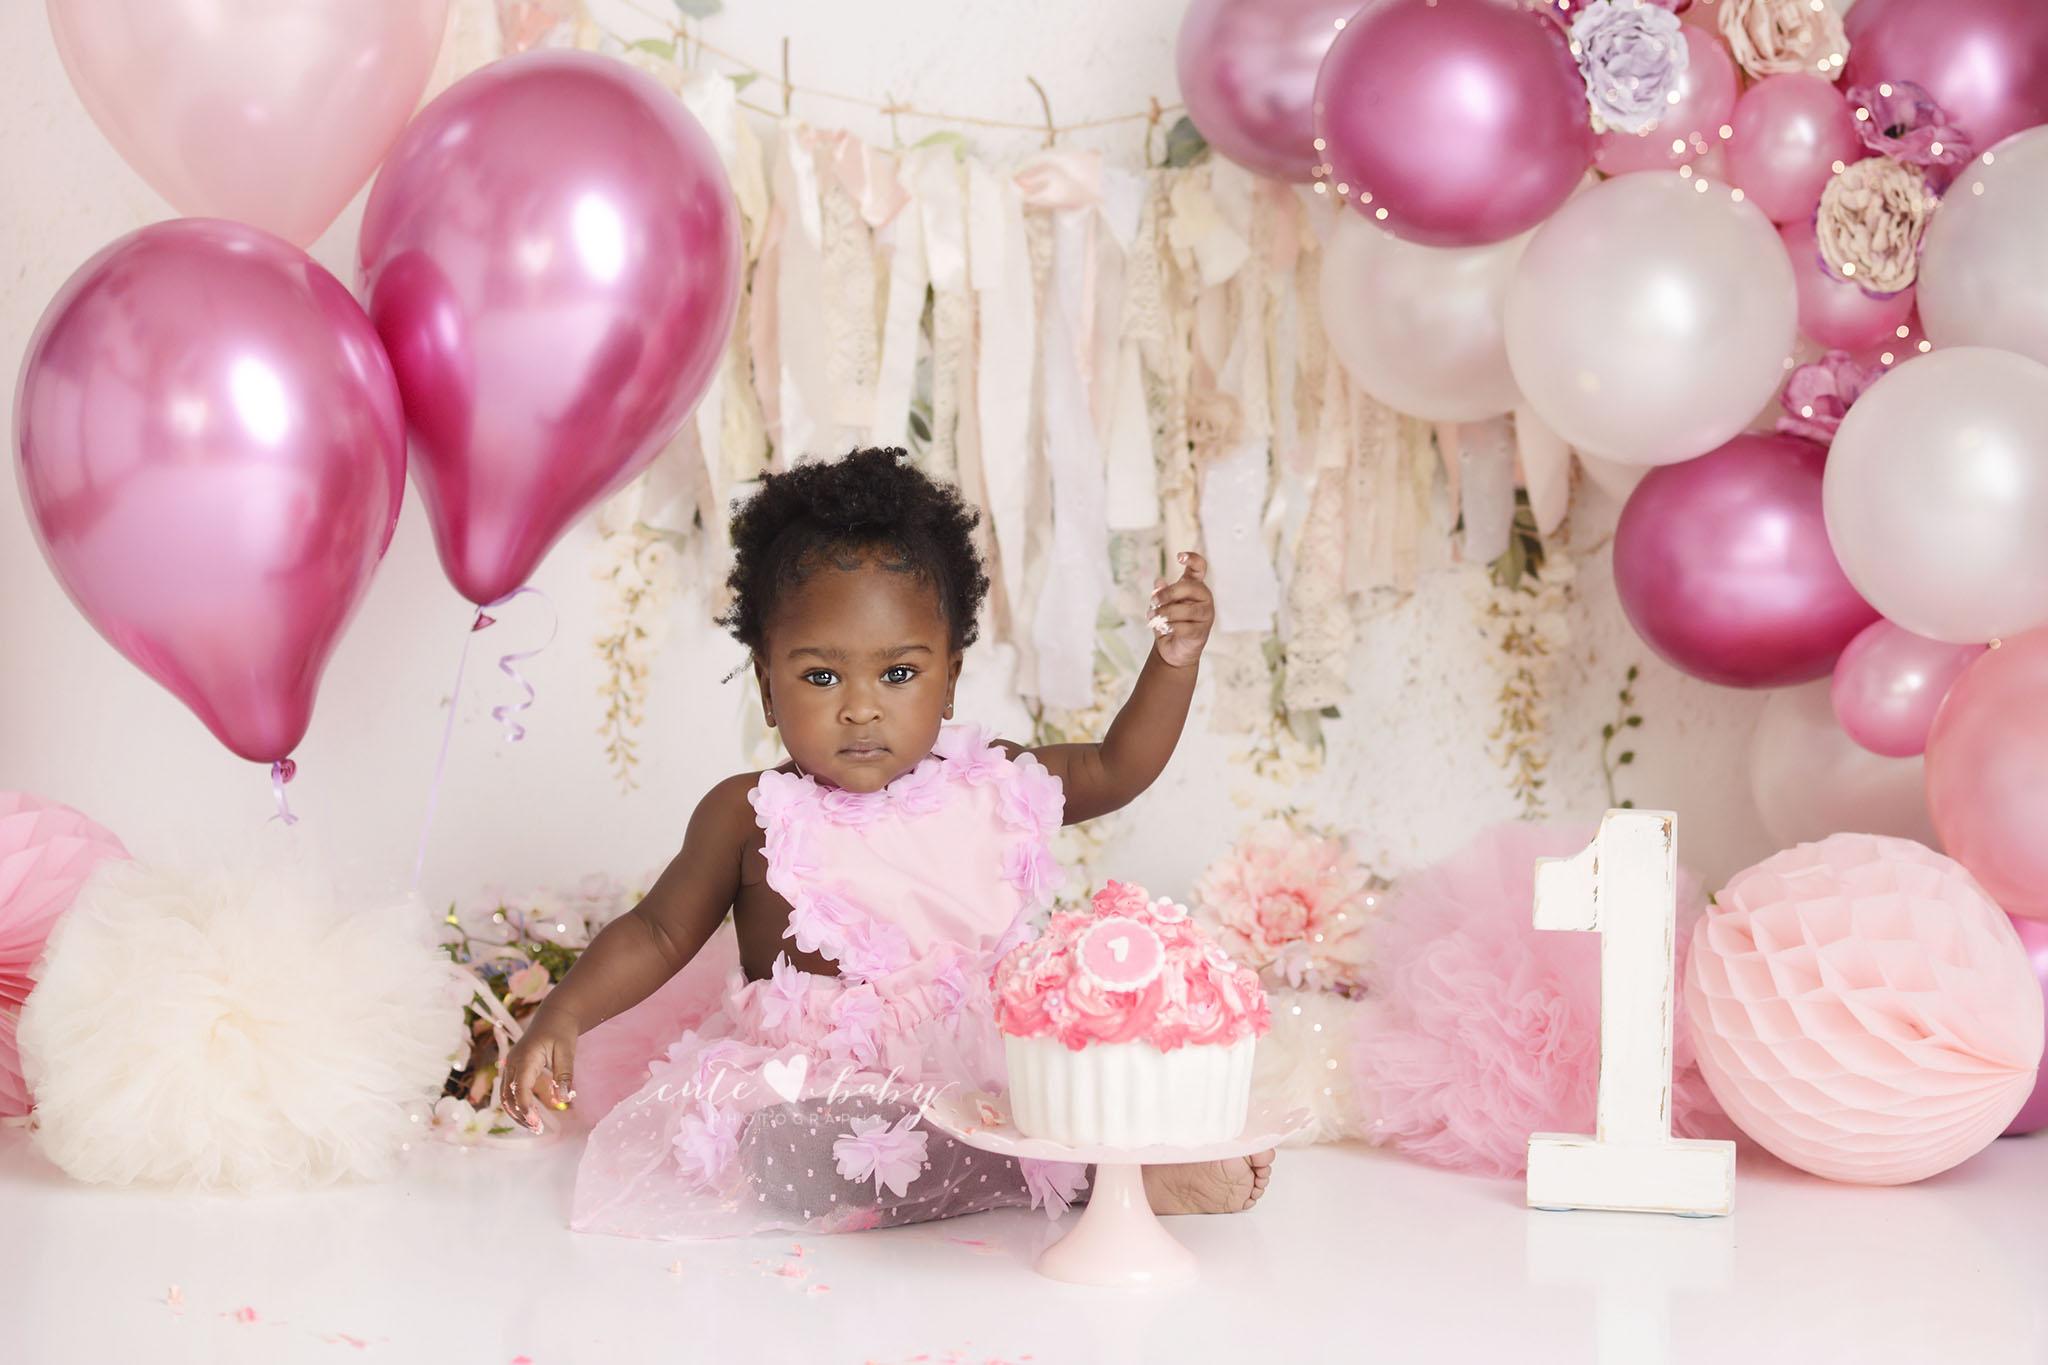 cake smash Manchester, Baby Photography Manchester, 1st Birthday photography, Cake Smash Pink